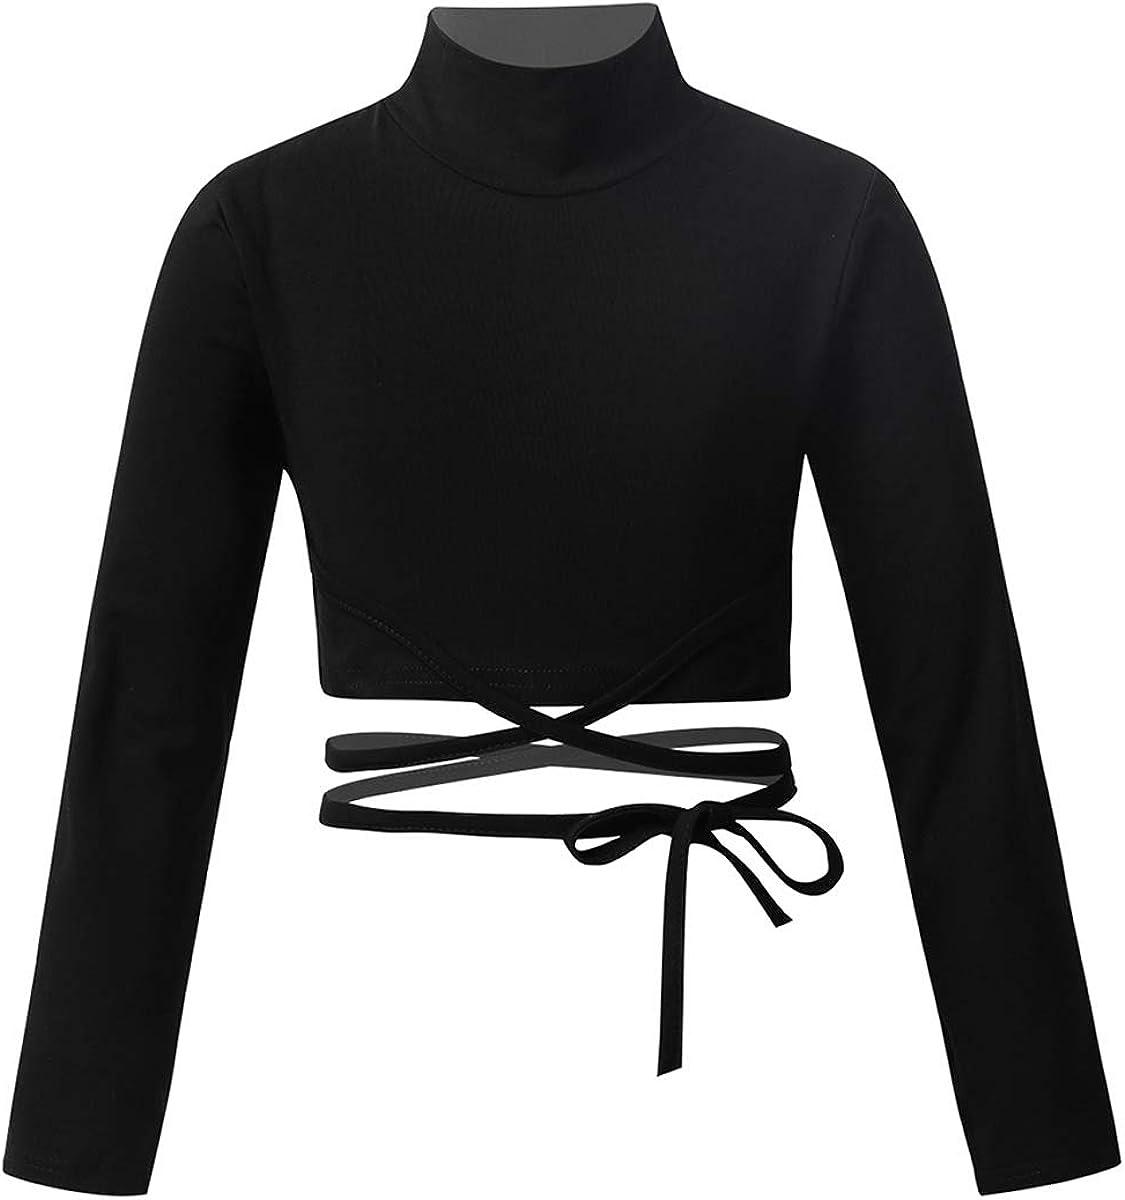 ACSUSS Kids Girls Long Sleeves High Neck Crop Top Ballet Dance Gymnastics Yoga Compression Workout Athletic T-Shirt